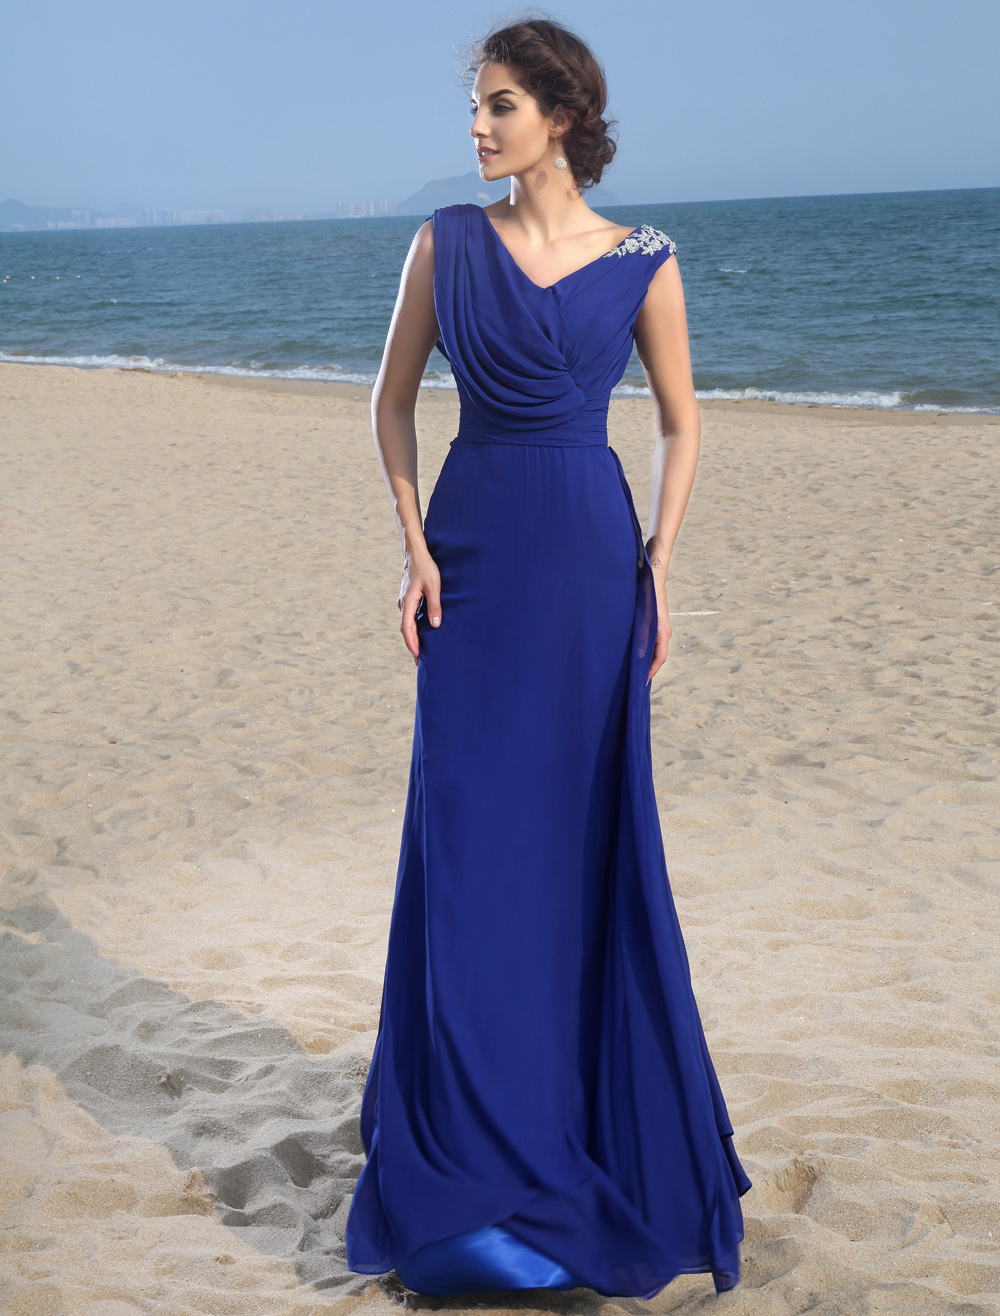 Off-The-Shoulder Royal Blue Chiffon Prom Dress (Wedding Prom Dresses) photo